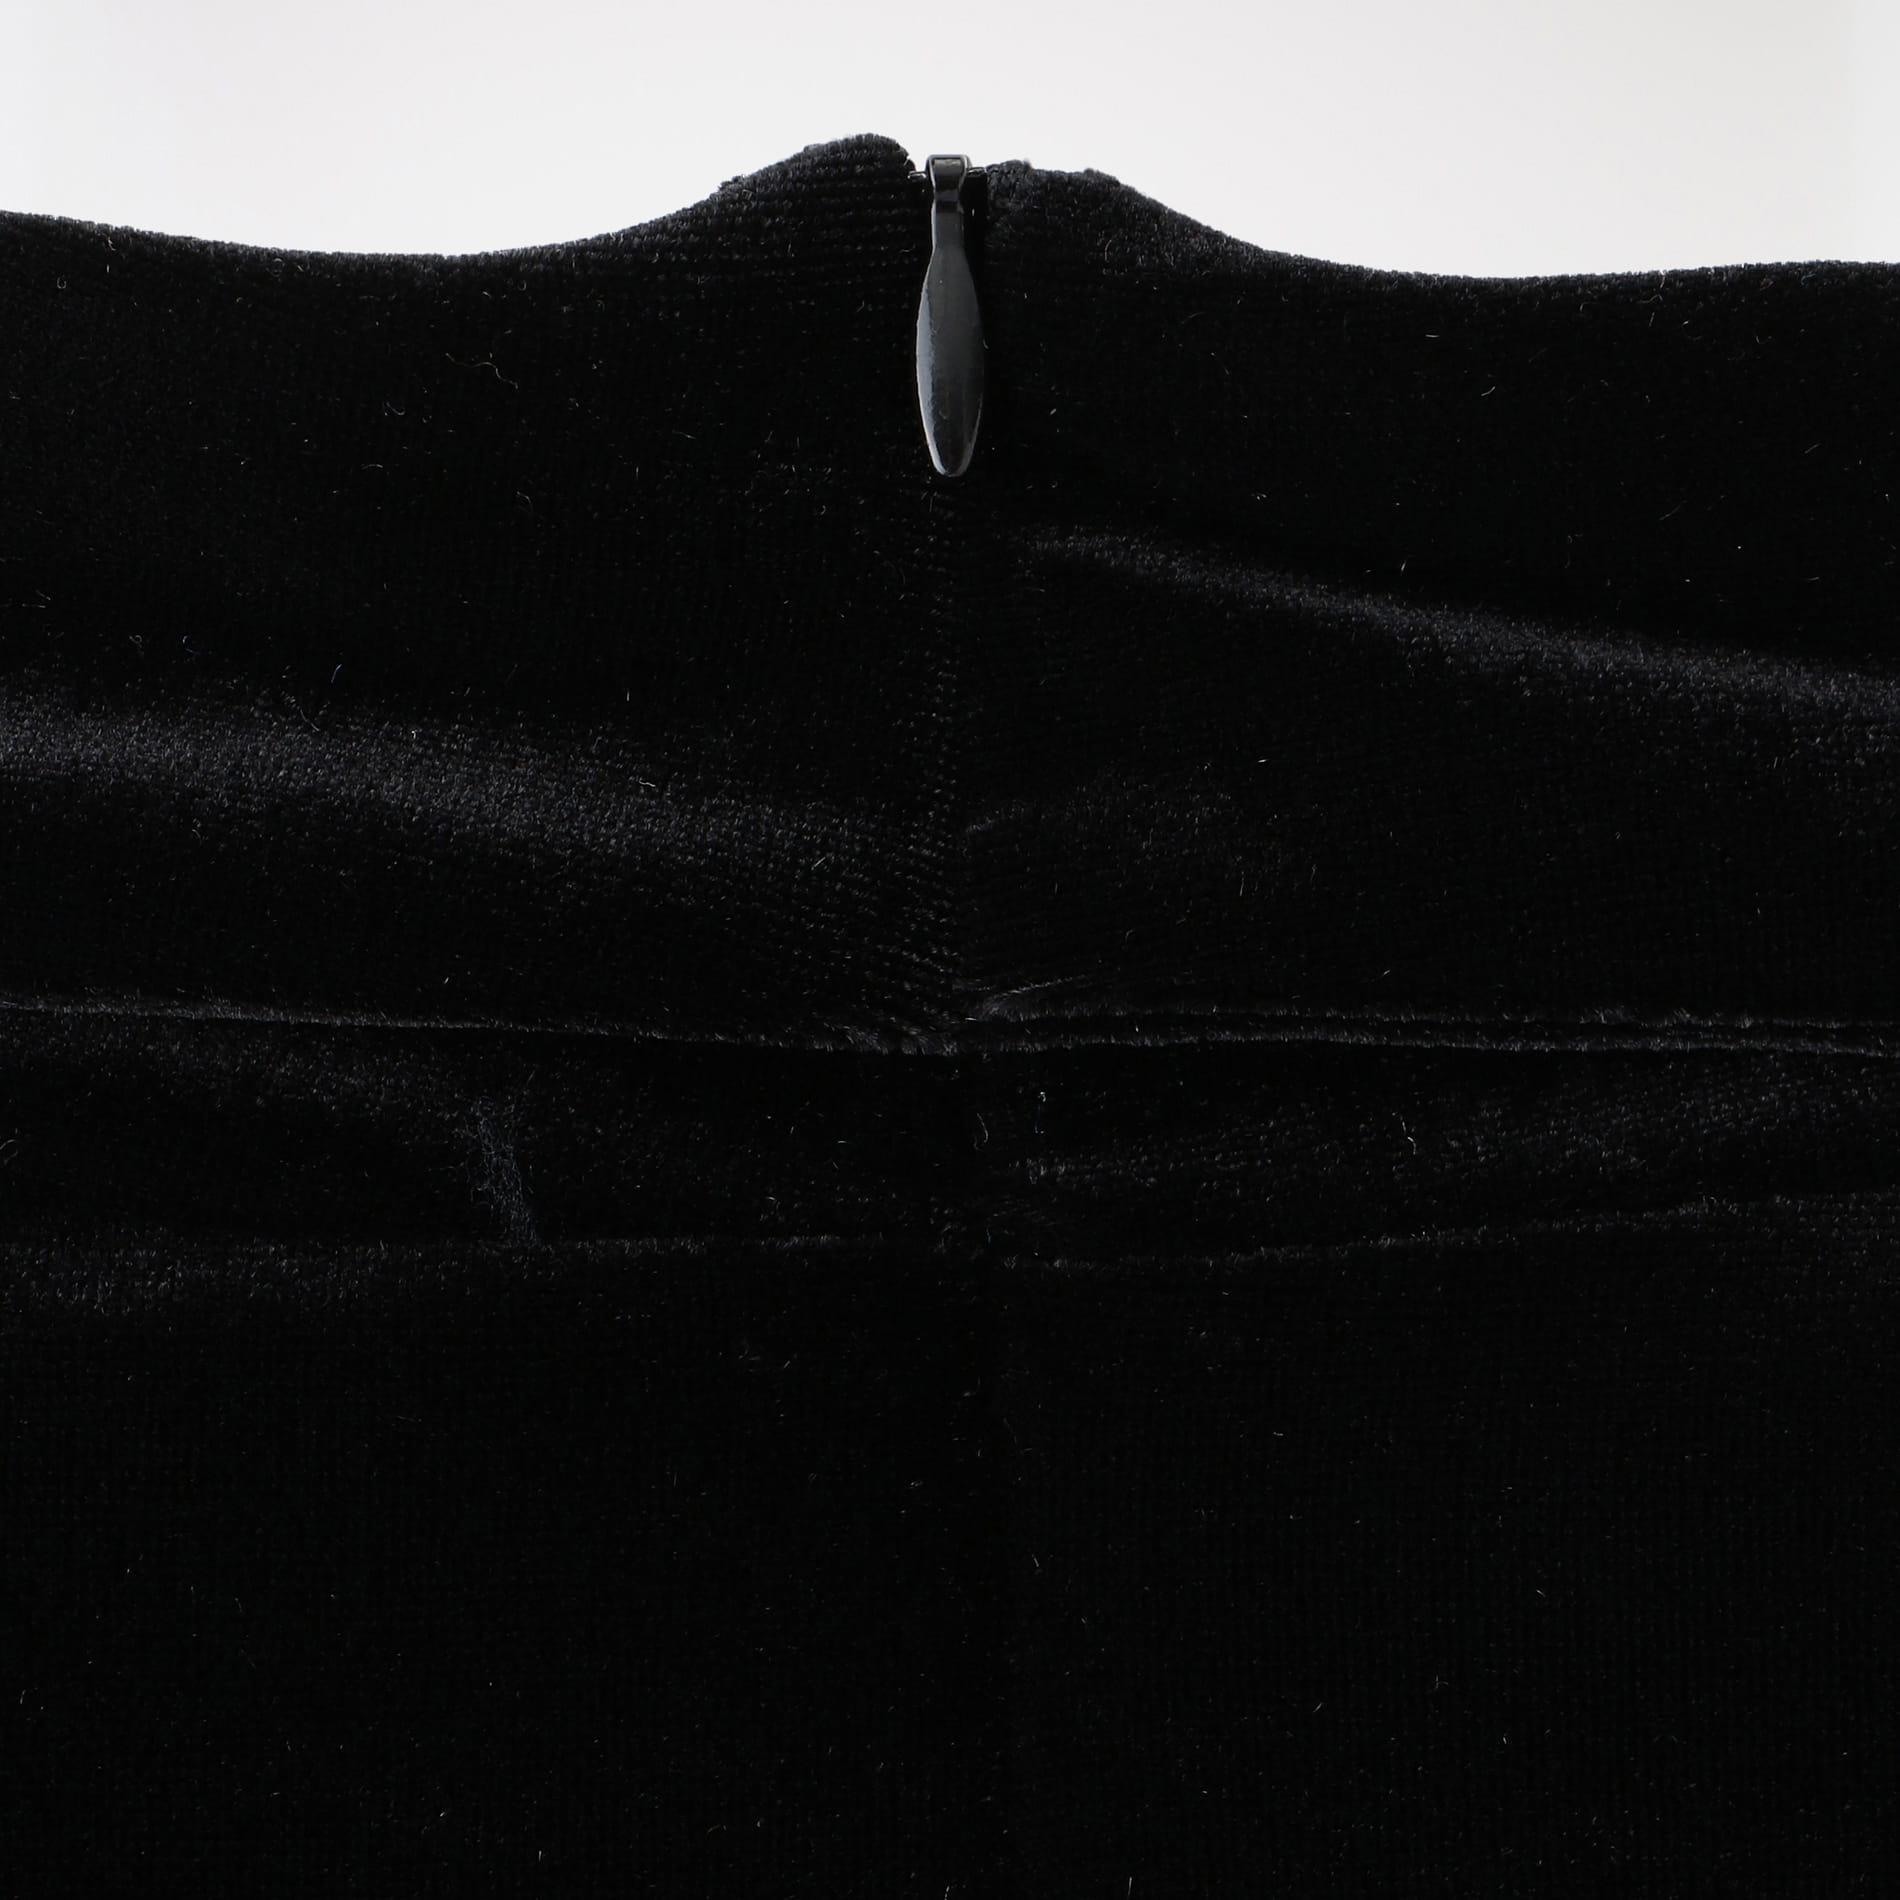 【MELITTA BAUMEISTER】WOMEN OPEN BACK BODY SUIT MB-07-FW20